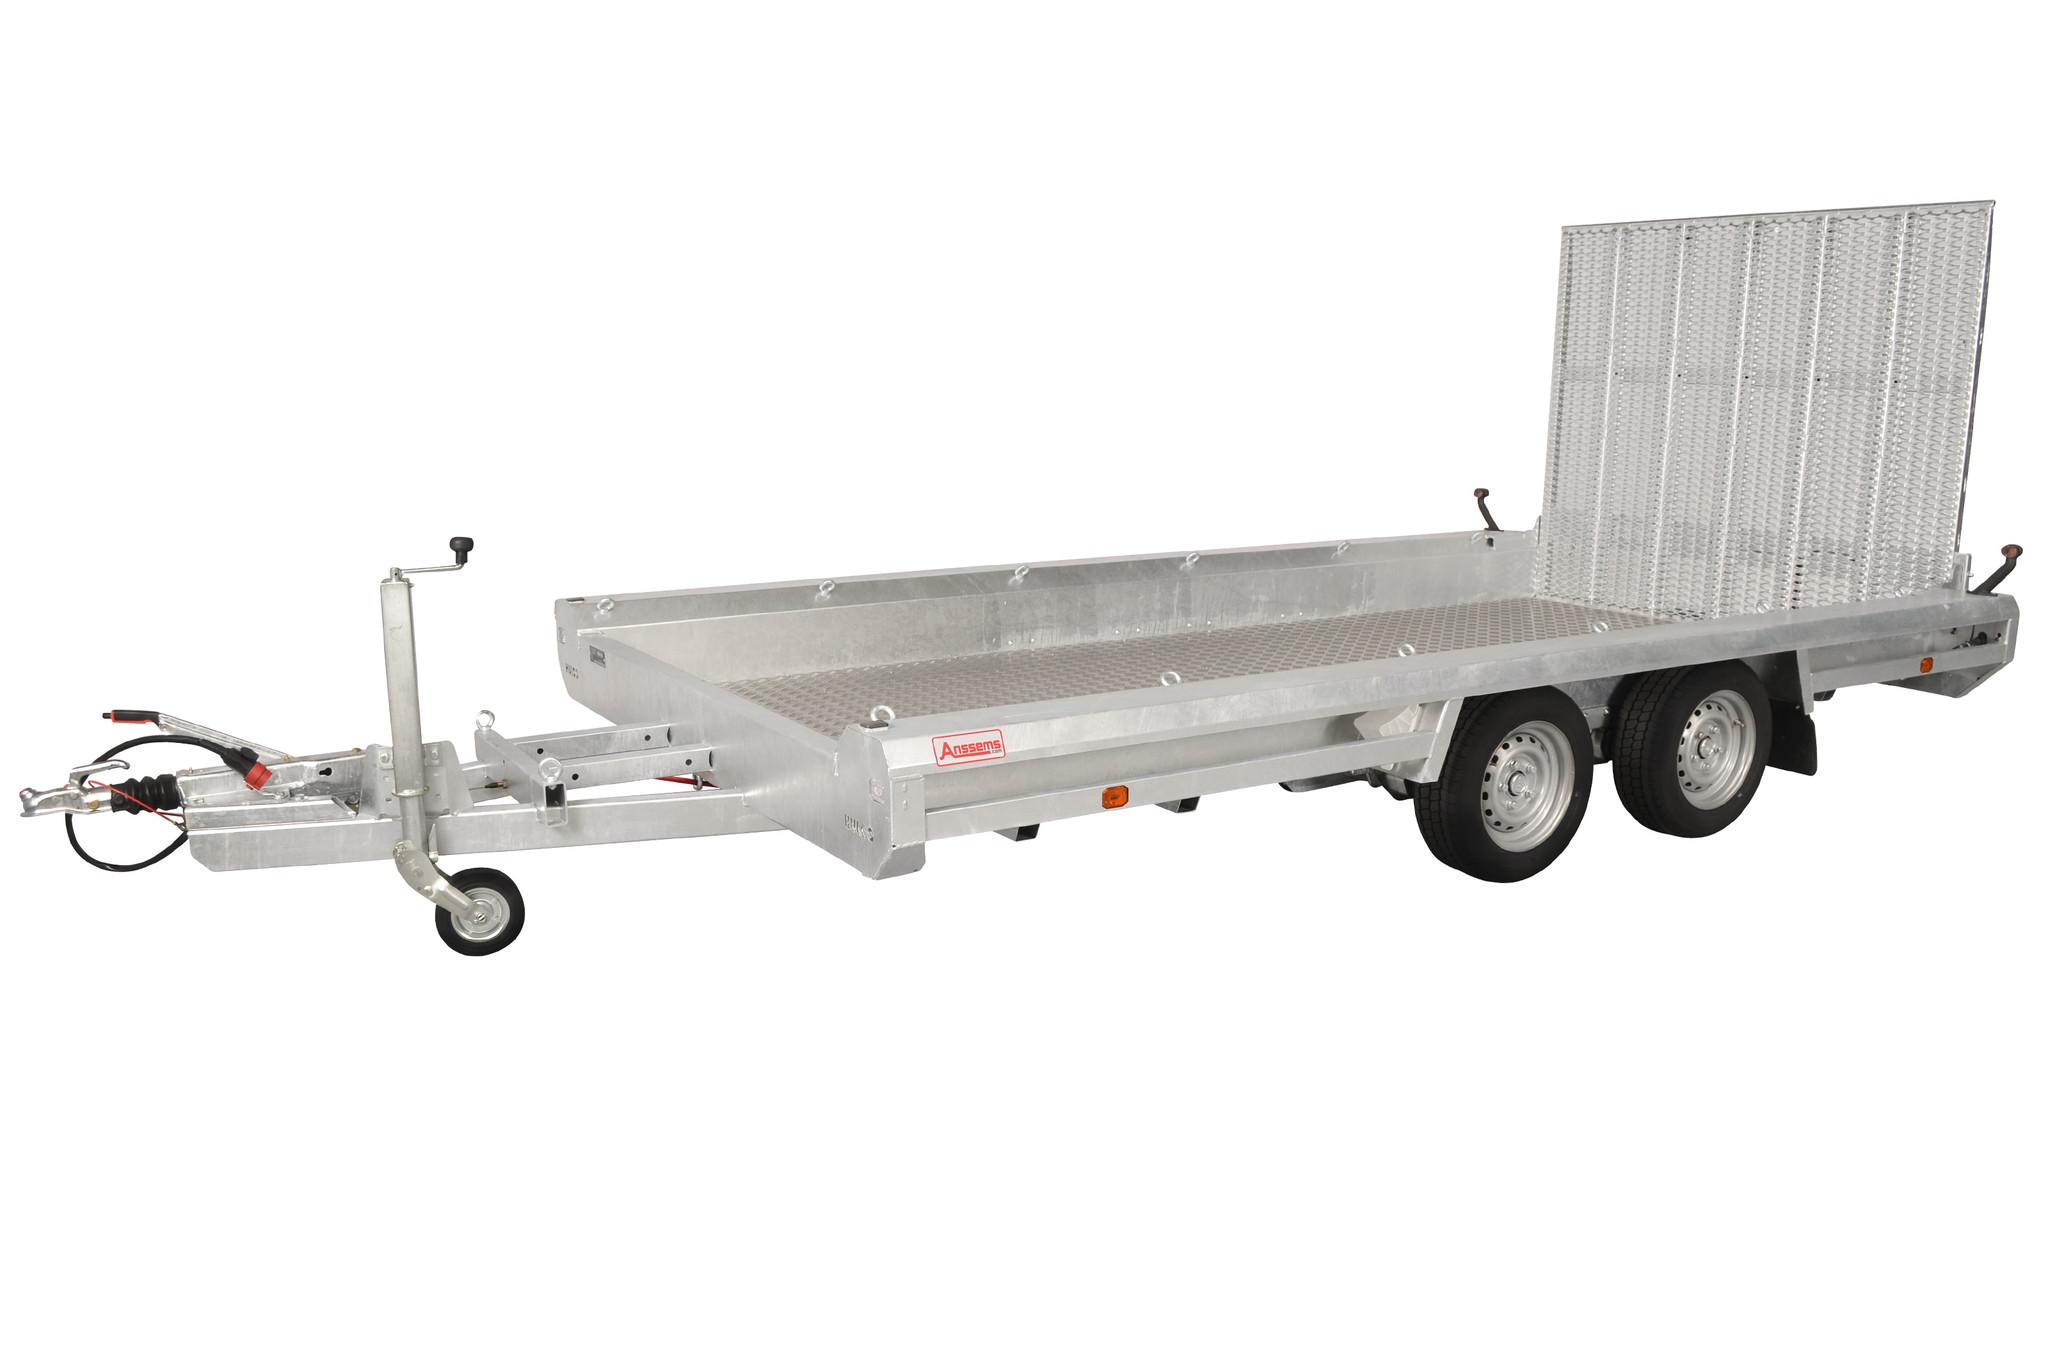 Hulco trailers Hulco TERRAX-2 3500 - 3500 kg bruto laadvermogen - machinetransporter - 394x180 cm laadoppervlak - geremd